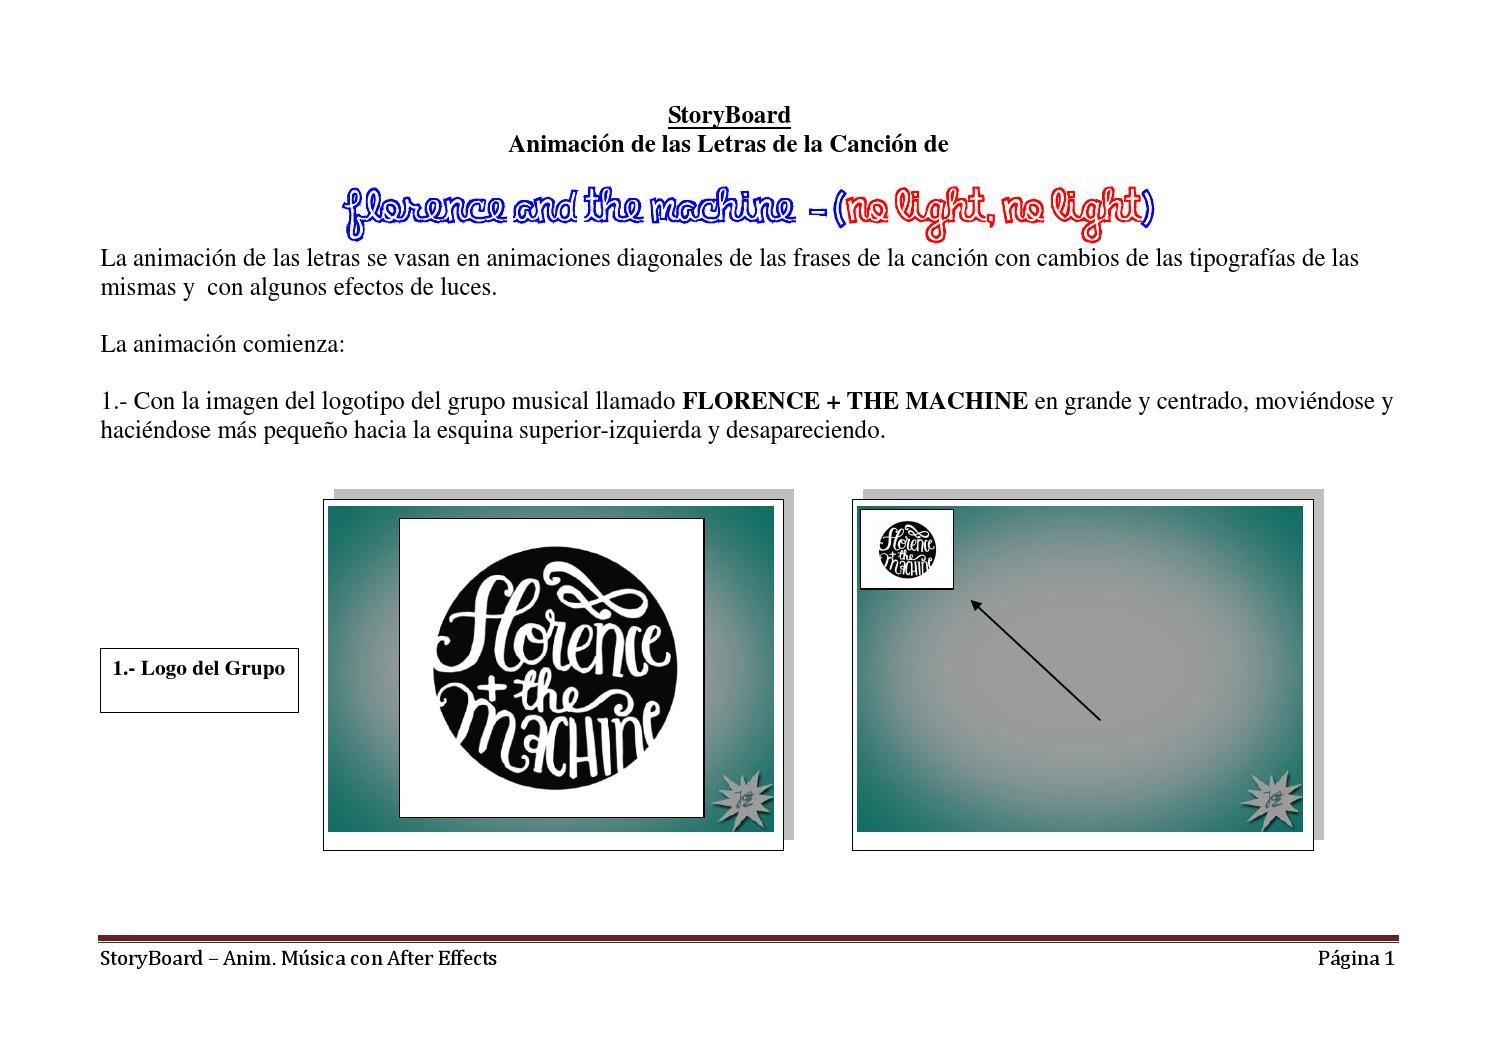 Storyboard Animacion Con Musica By Storm39 Issuu